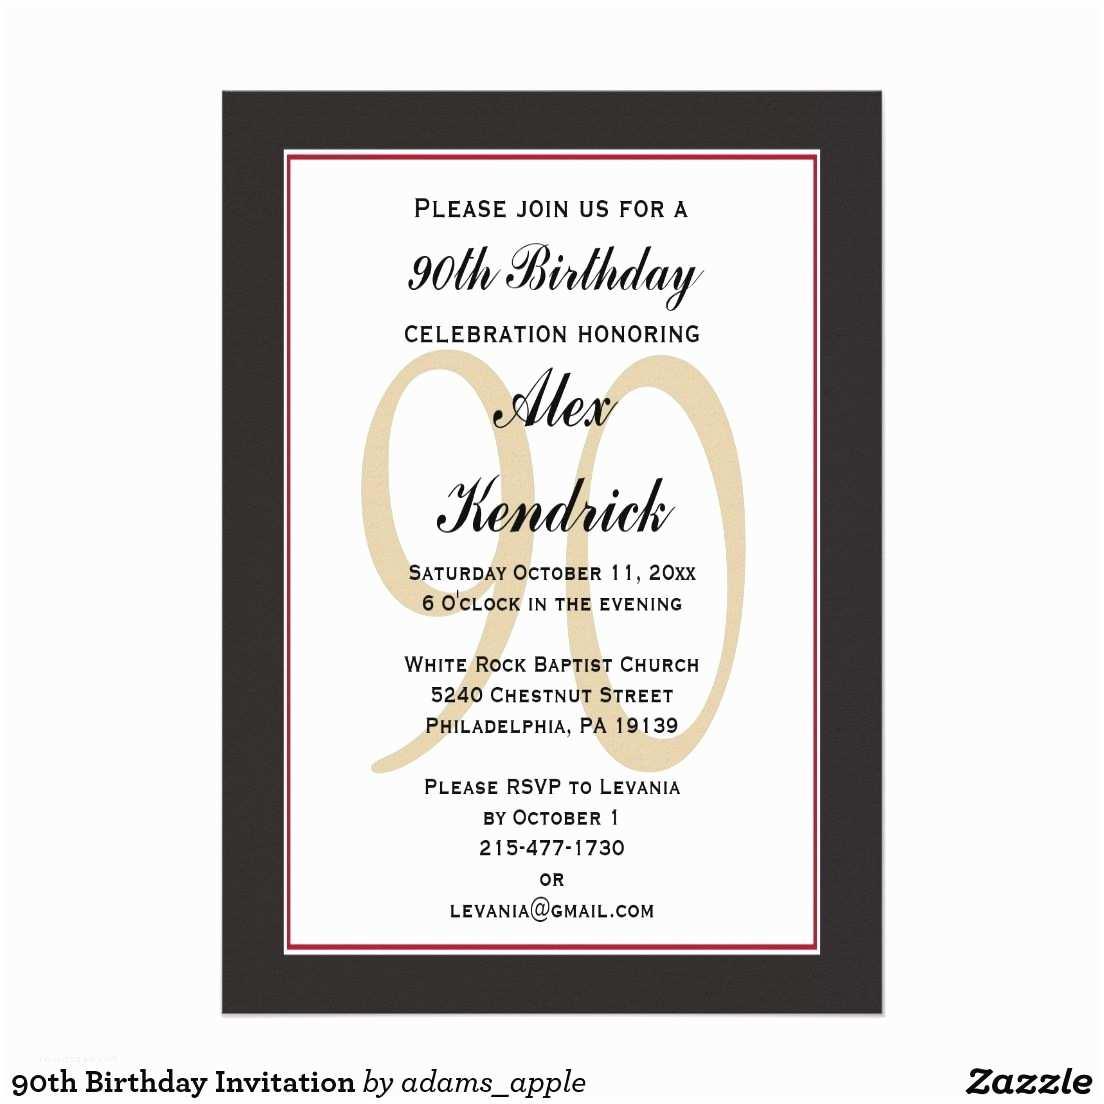 90th Birthday Party Invitations 90th Birthday Invitation